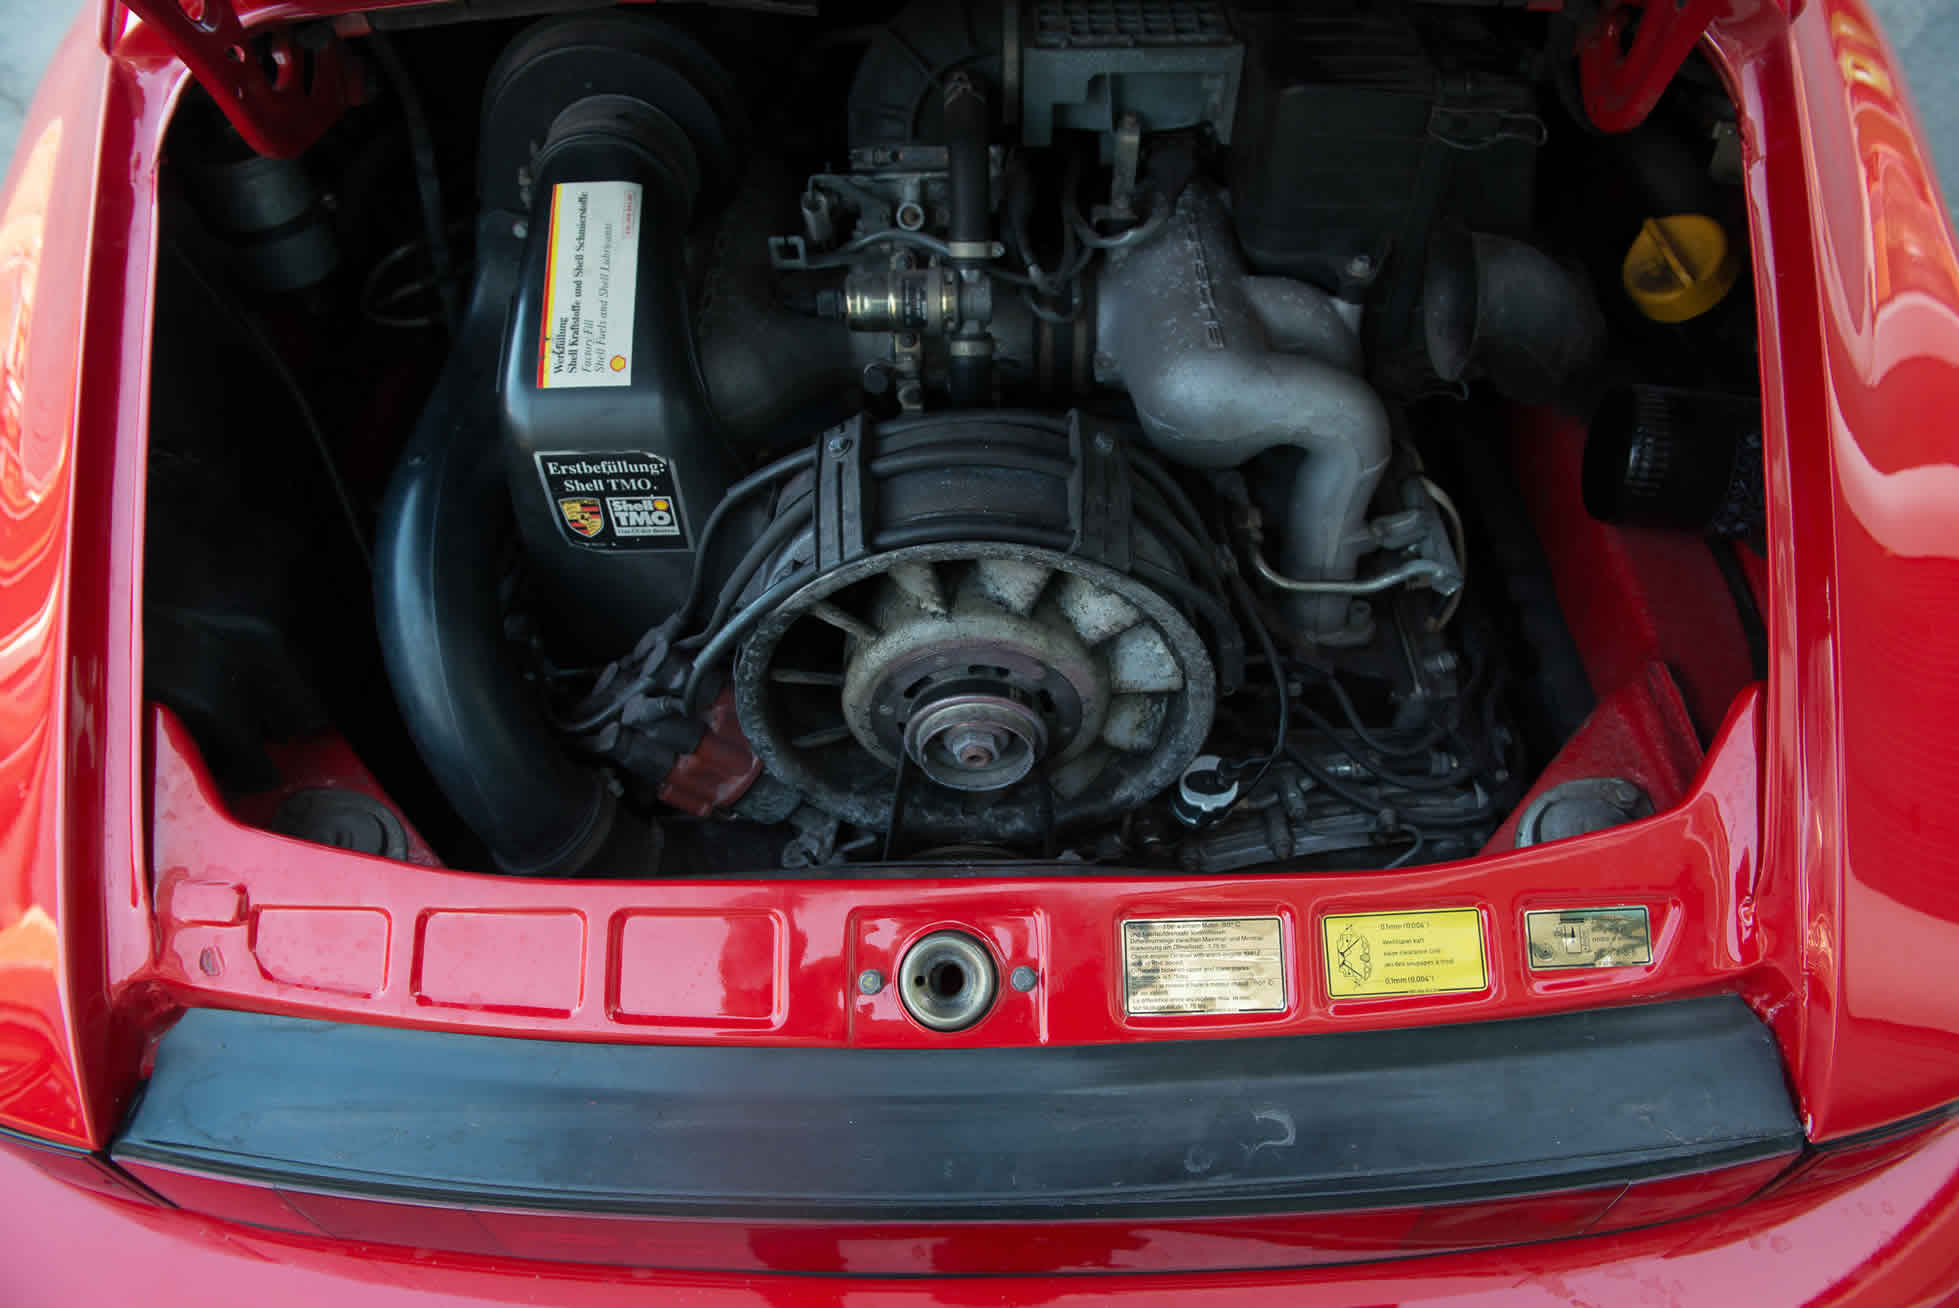 For Sale 1989 Porsche 3.2 Carrera Club Sport engine